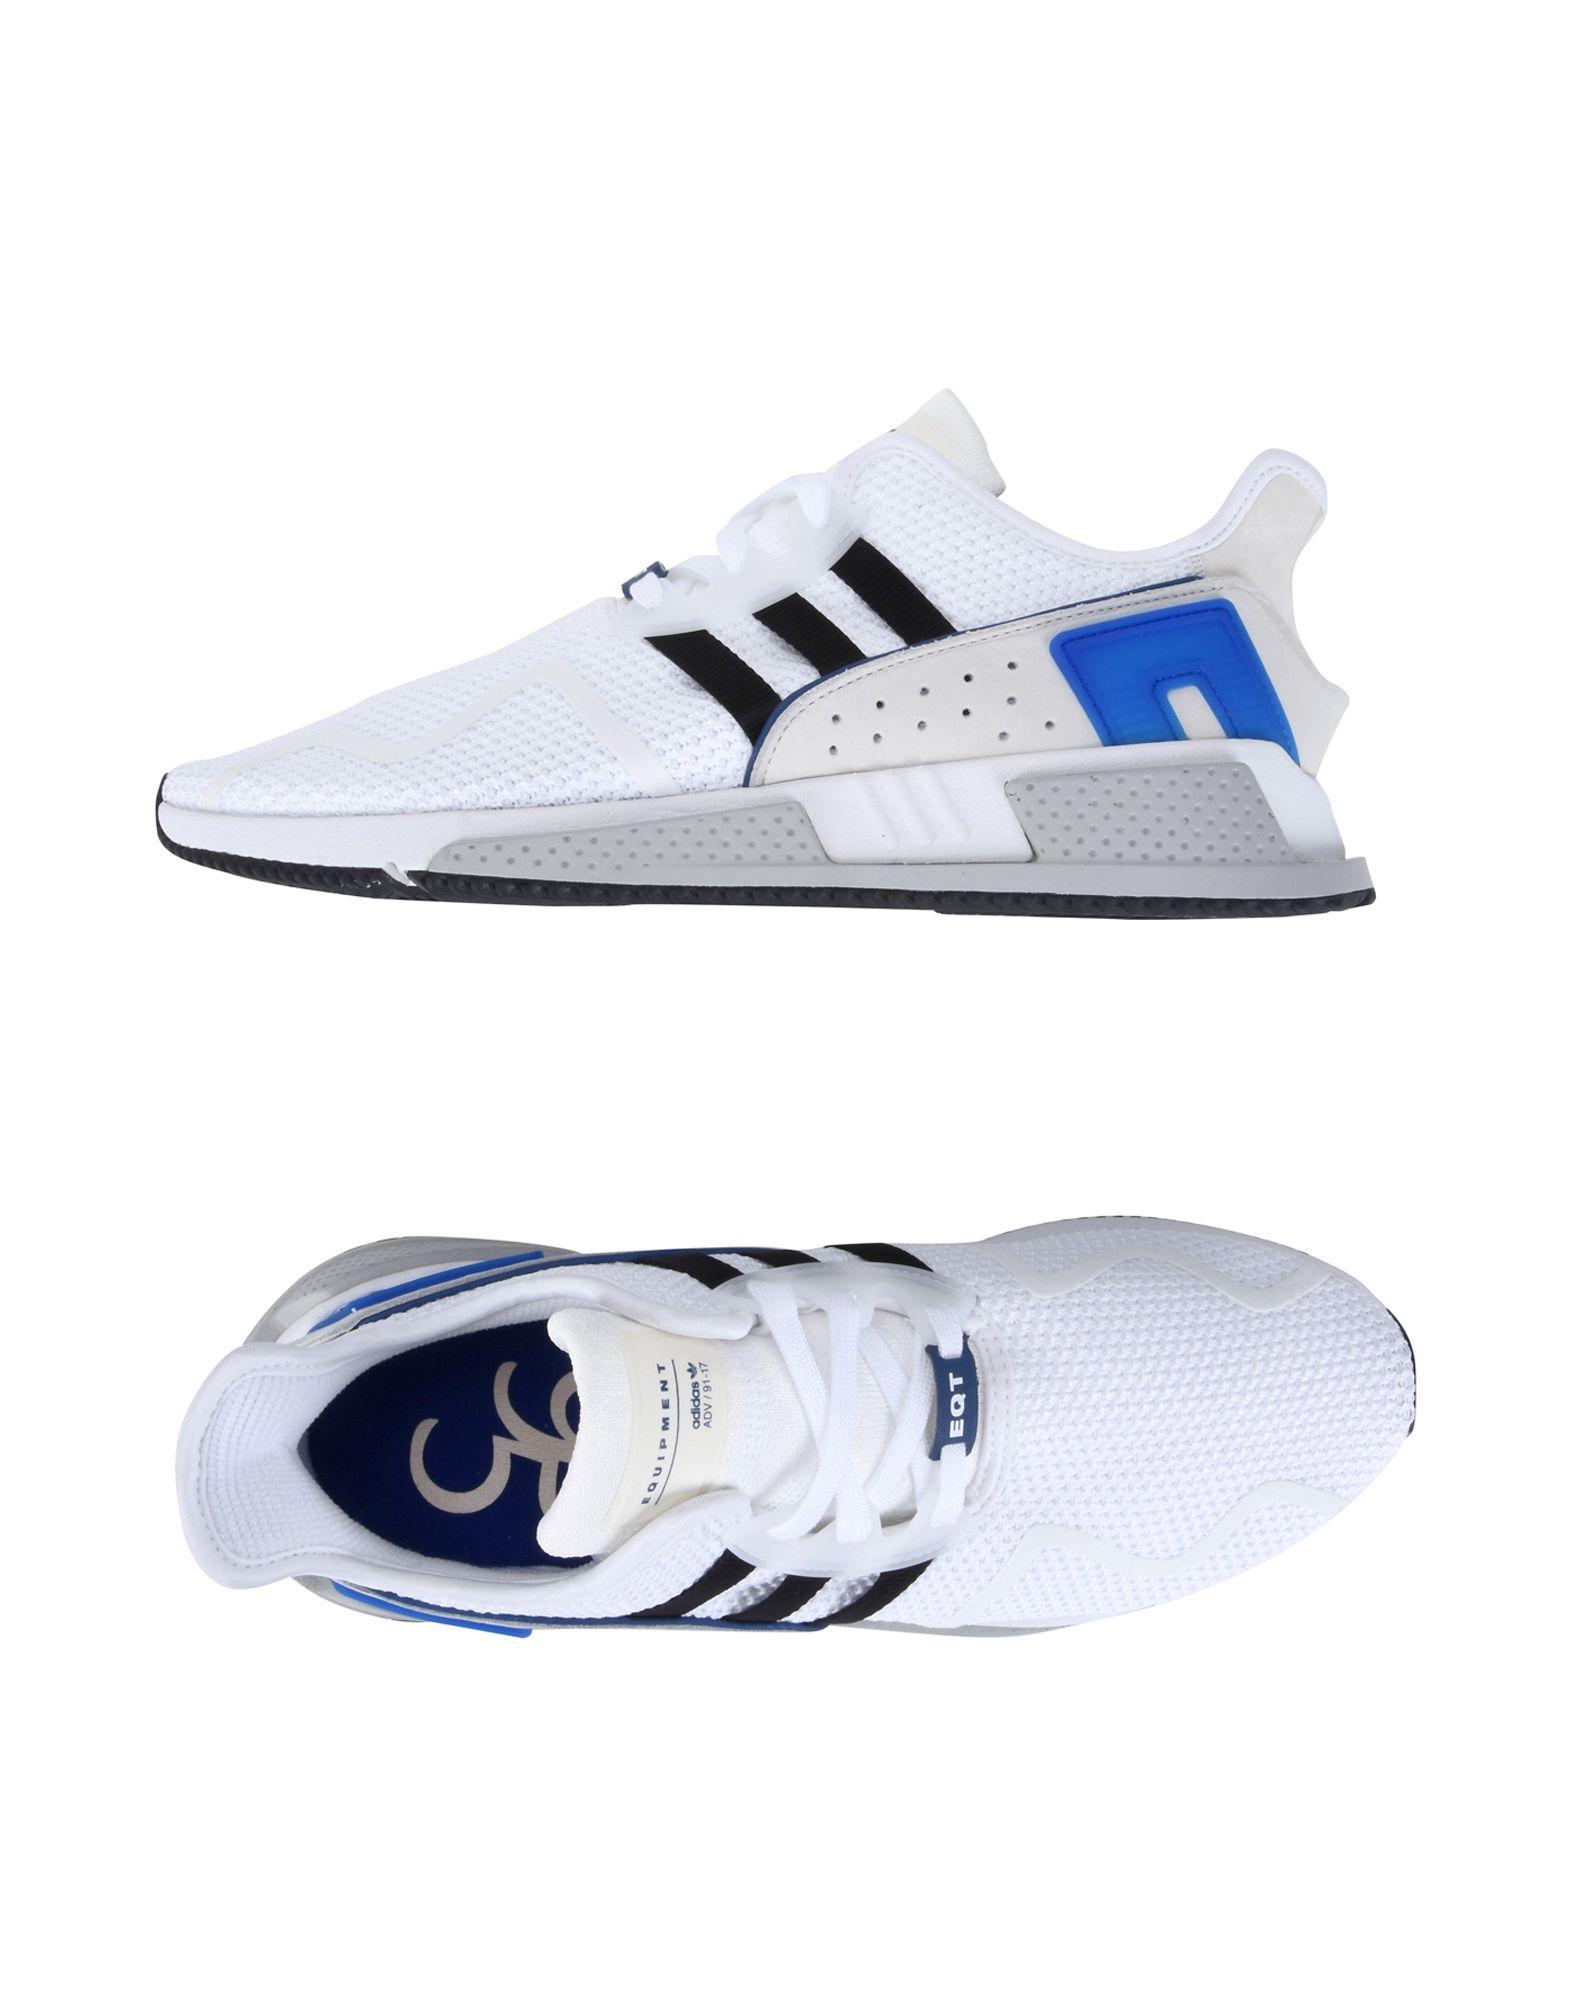 Baskets Adidas Originals Eqt Cushion Adv - Homme - Baskets Adidas Originals  Blanc Remise de marque